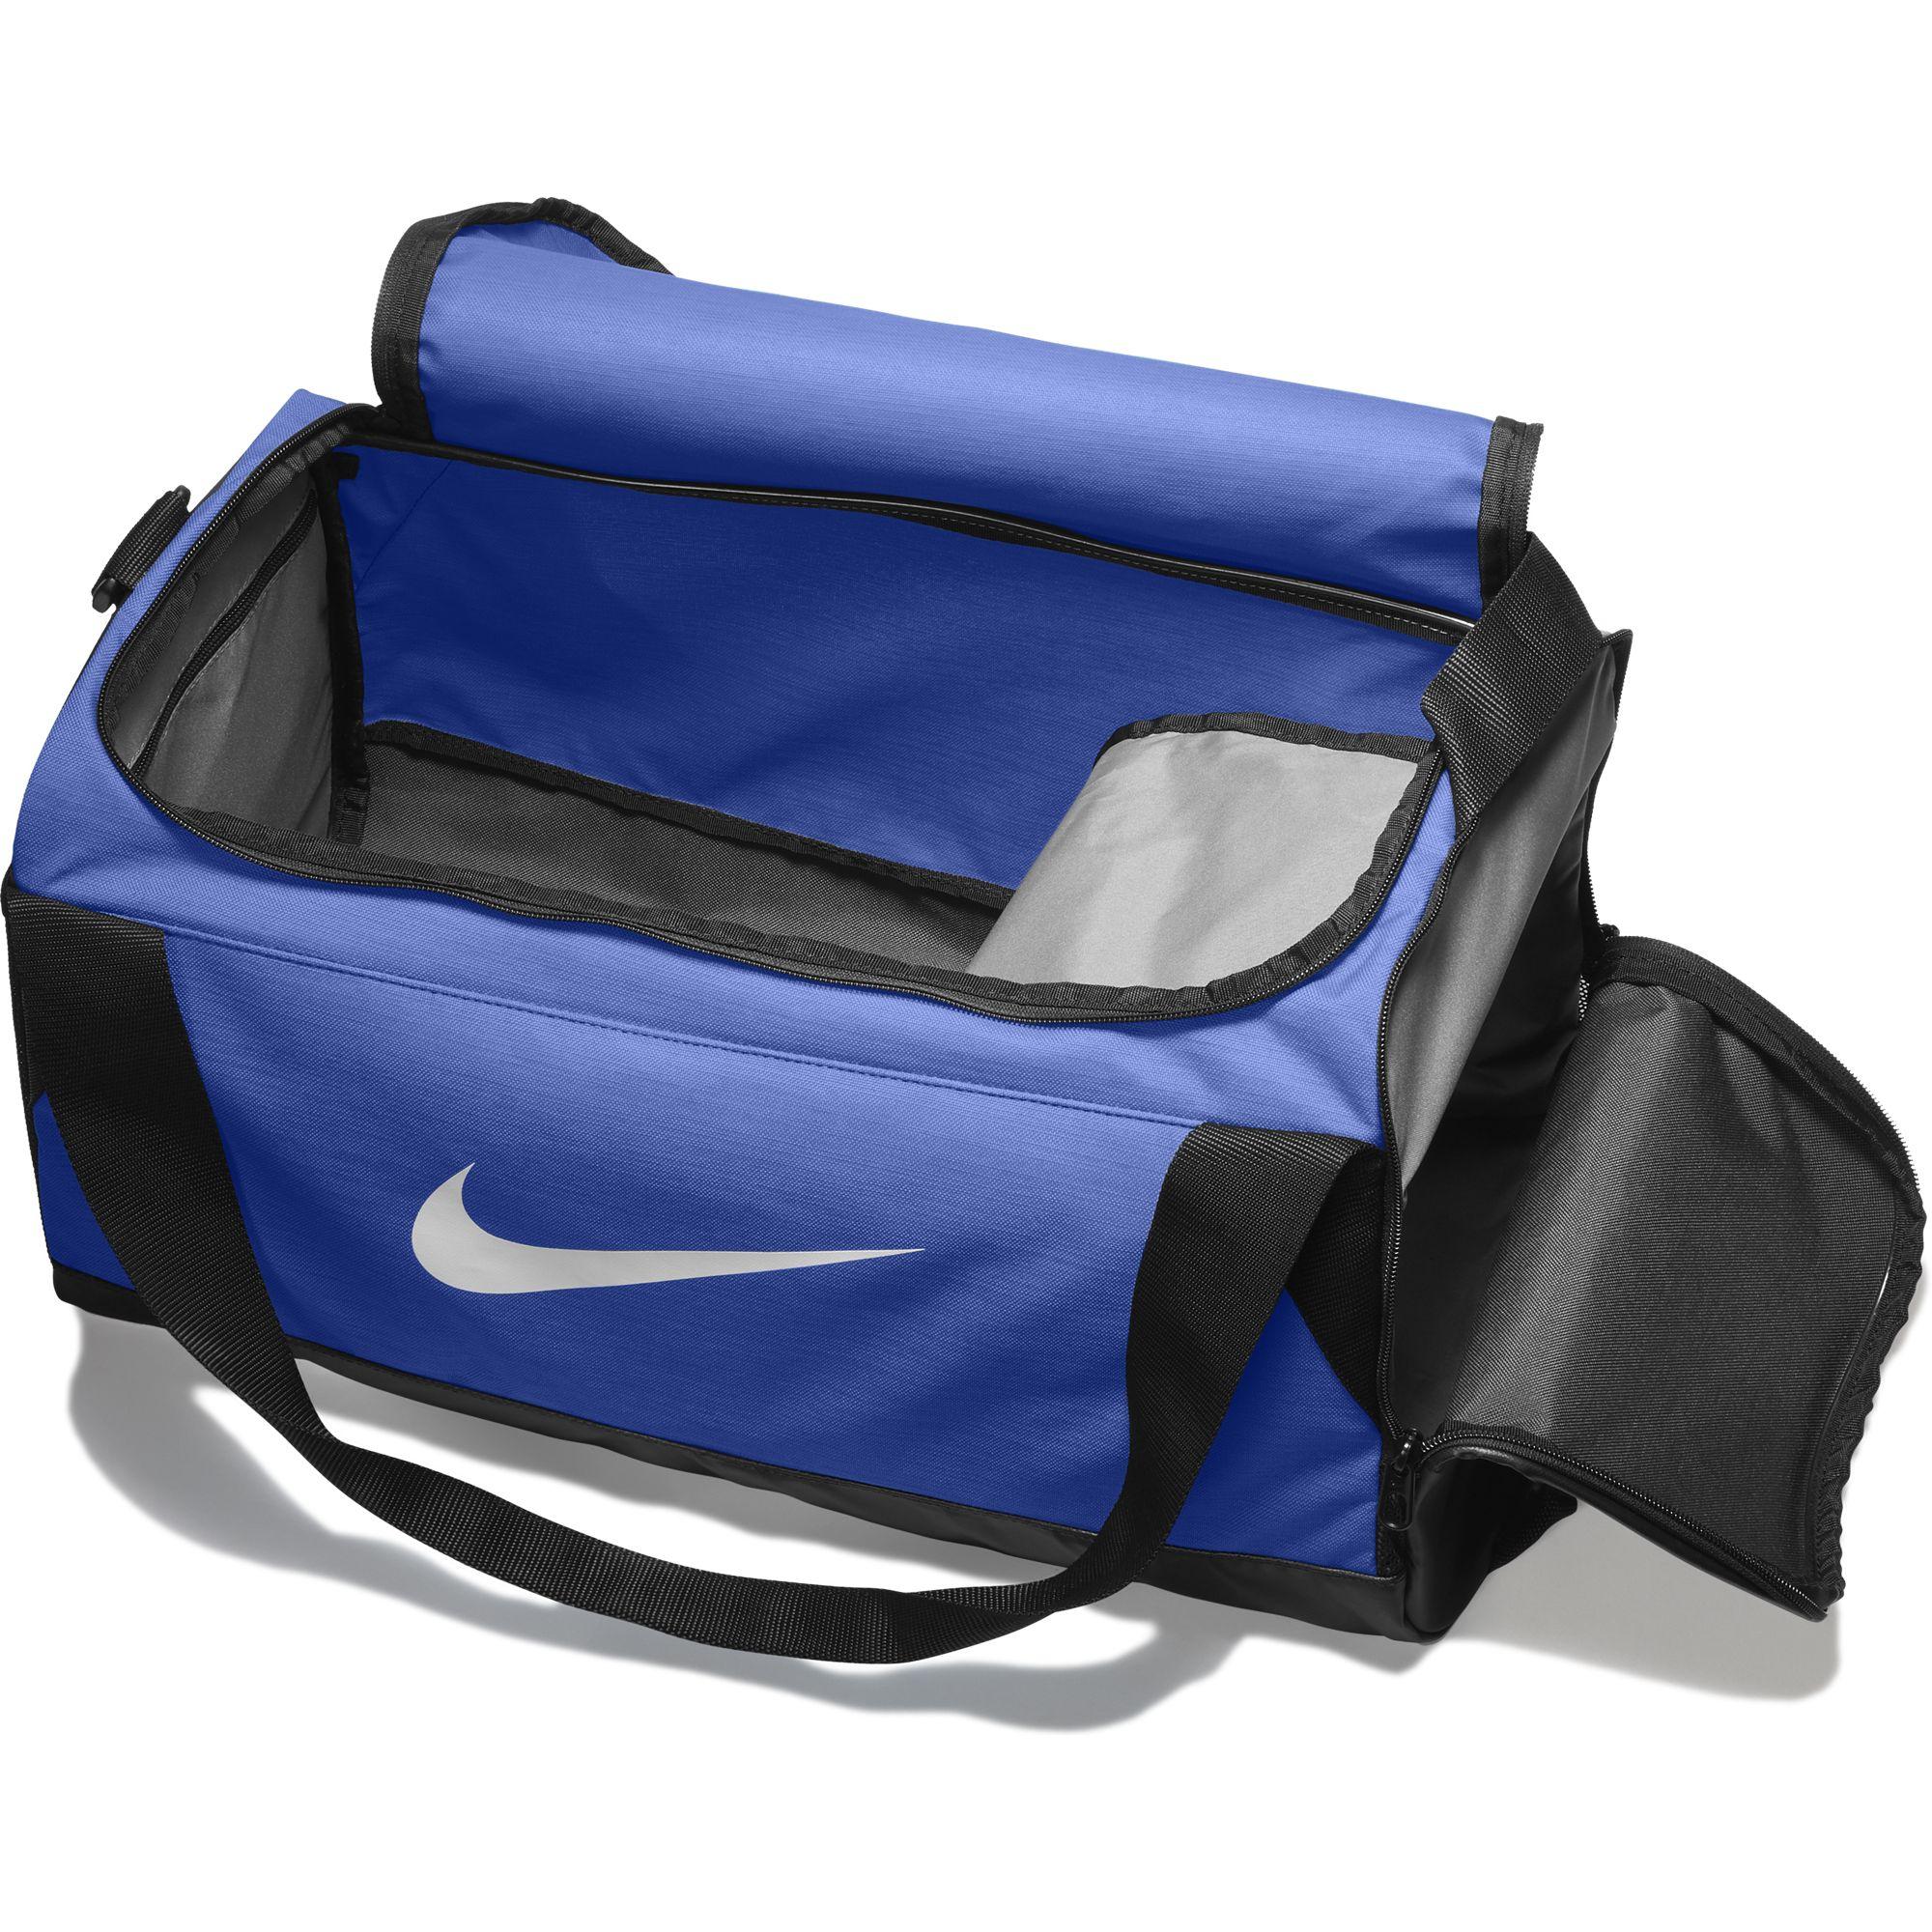 9ed0709924fbe Nike New BRASILIA Duffel Bag Training Travel Gym Sports Unisex Men ...